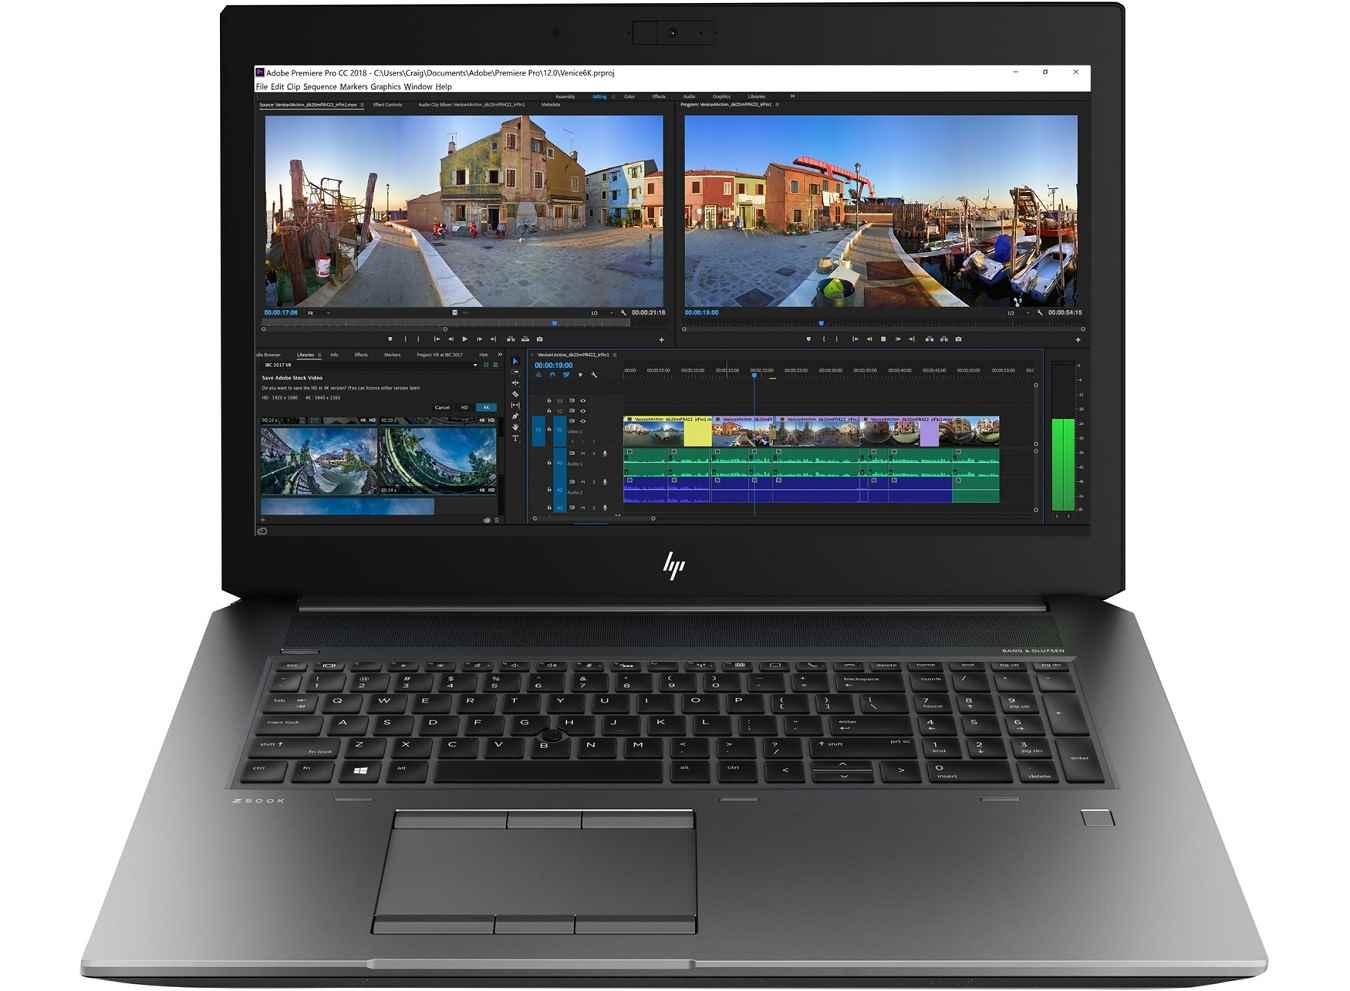 لپ تاپ استوک اچ پی مدل HP ZBOOK 15 G5 XEON Quadro P2000